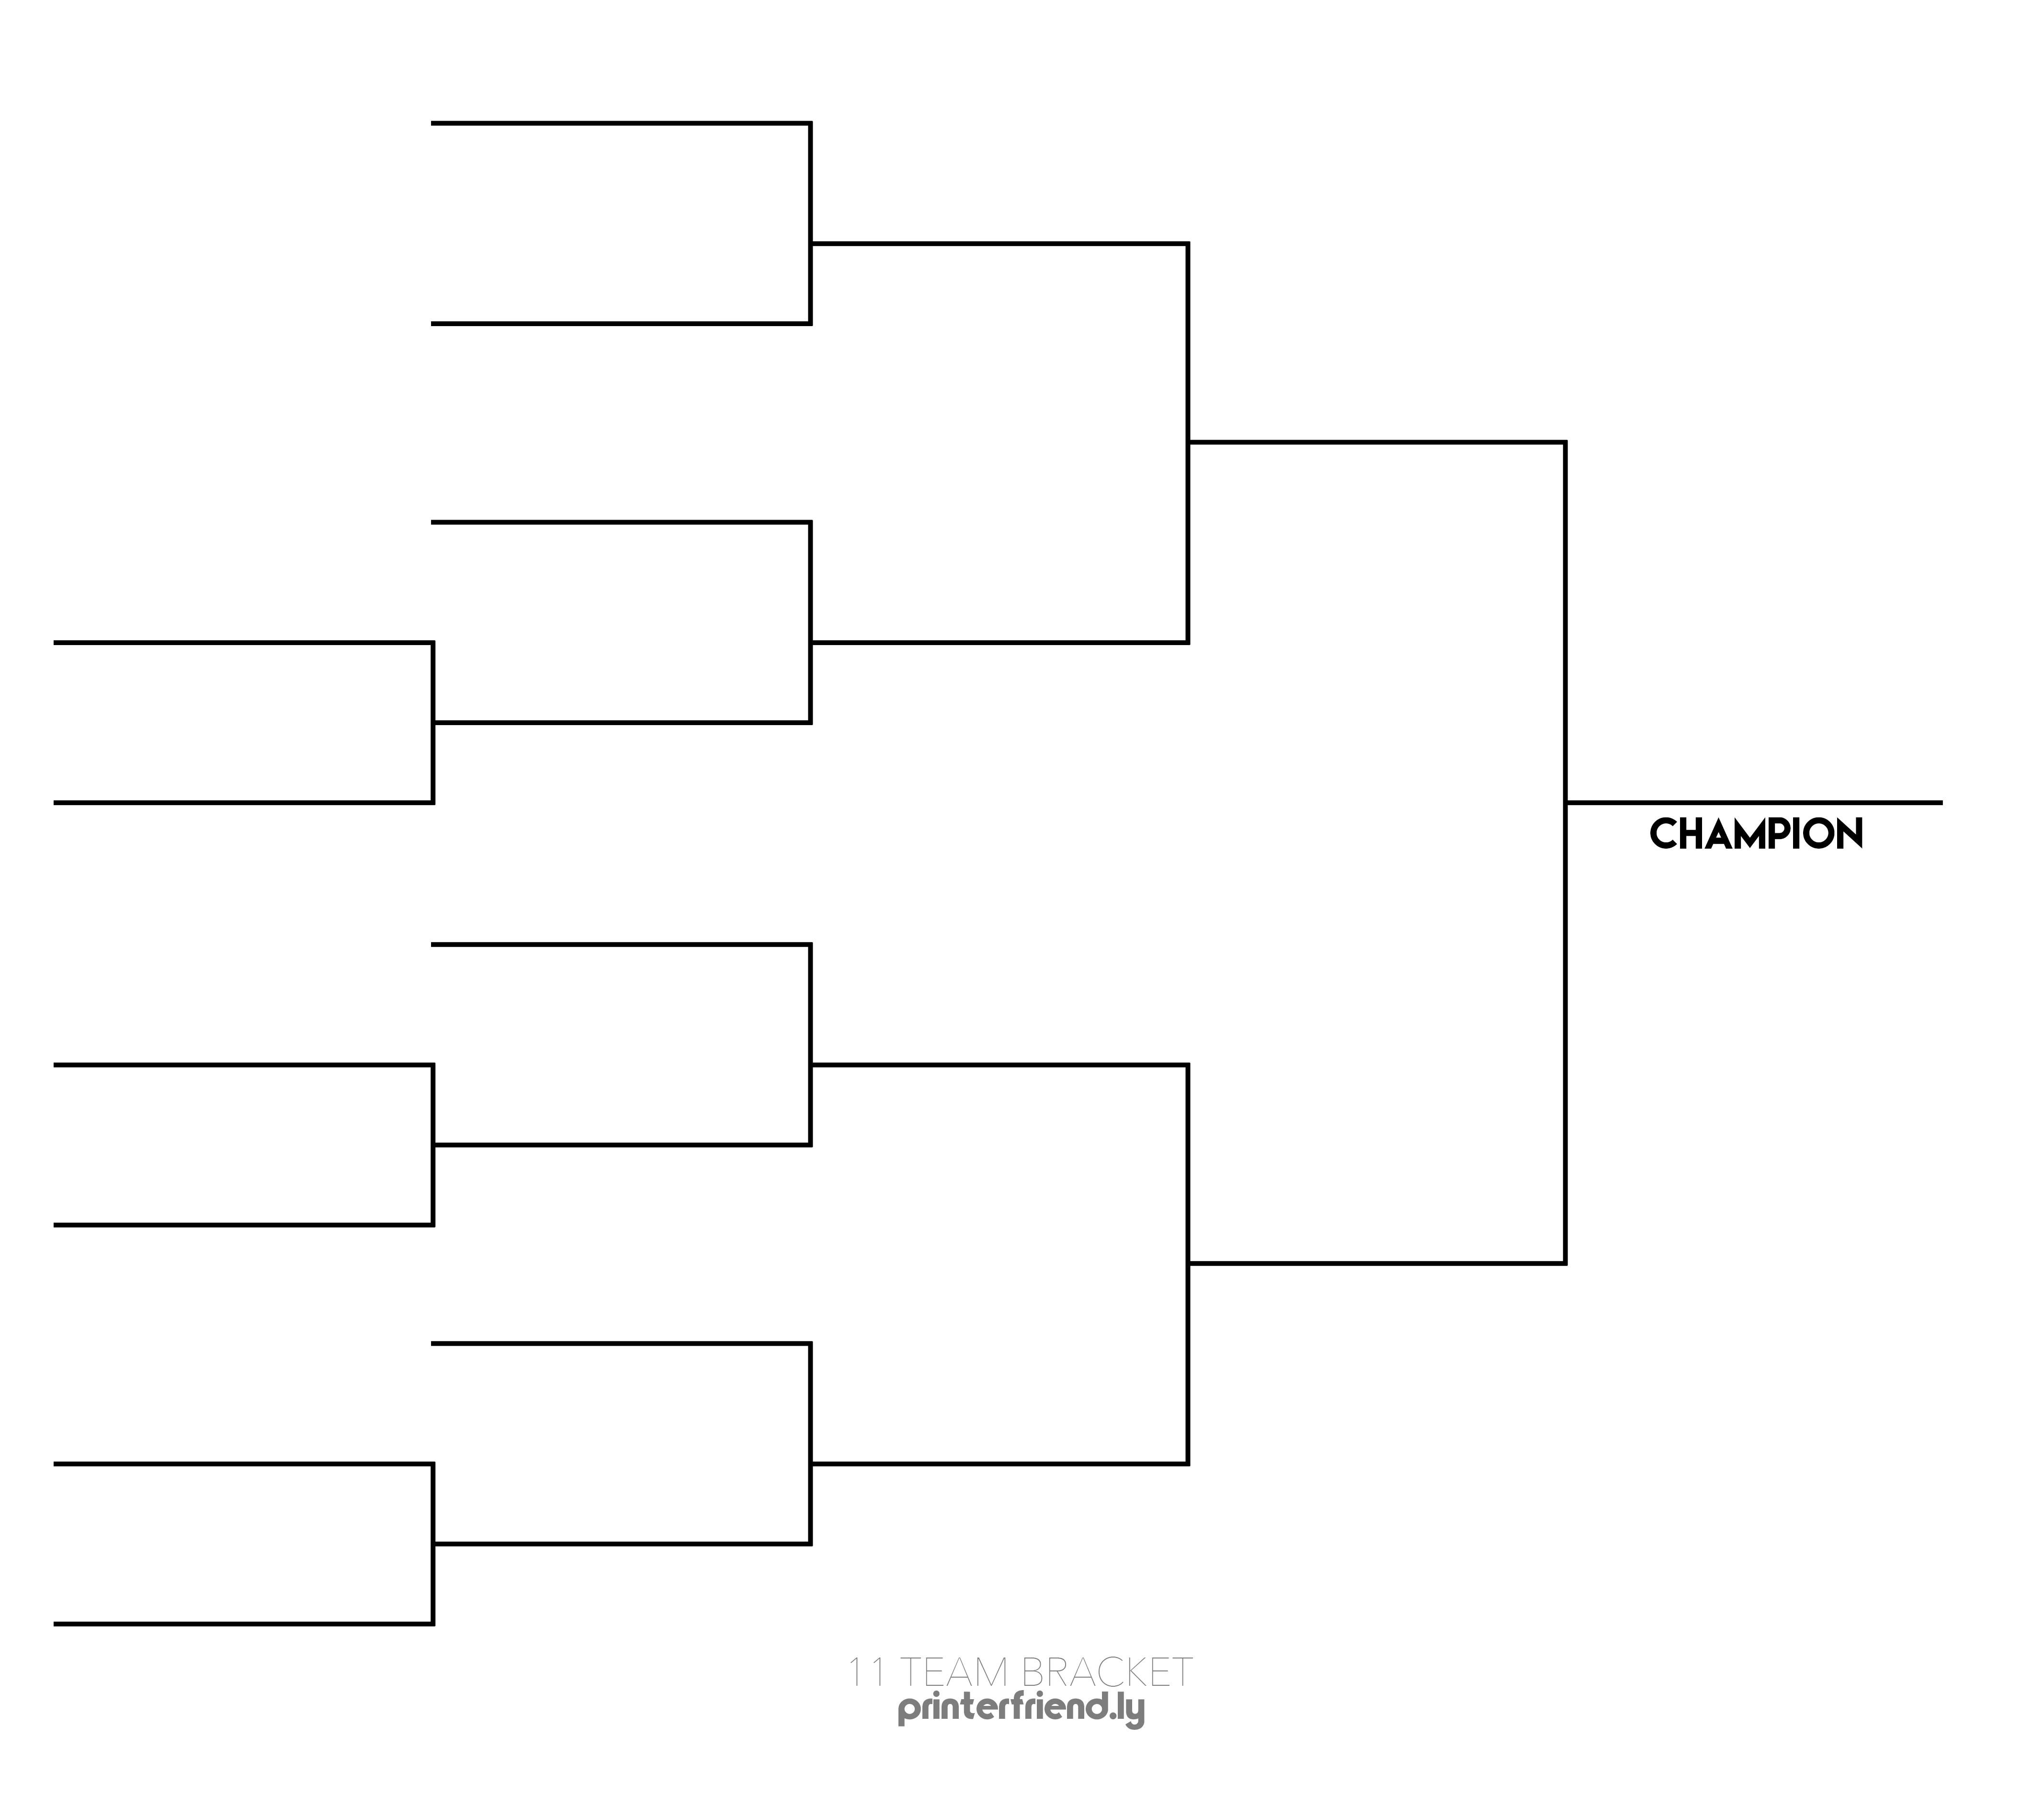 11 Team Printable Tournament Bracket